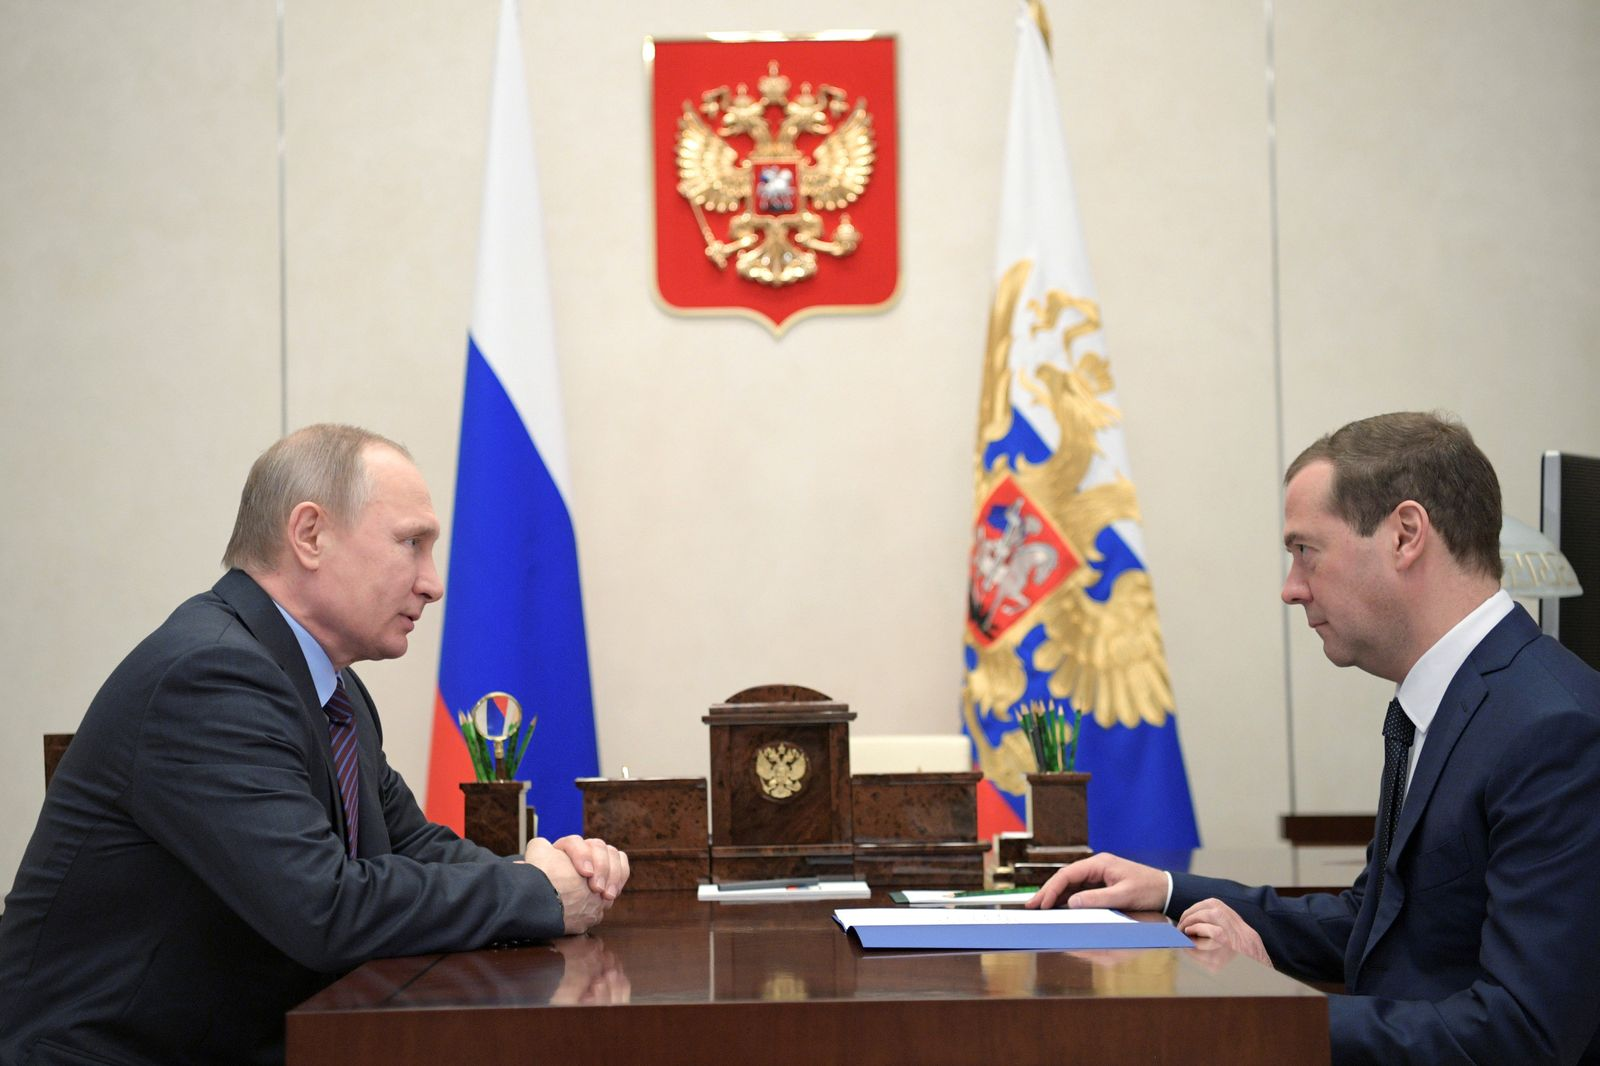 Medwedew / Putin